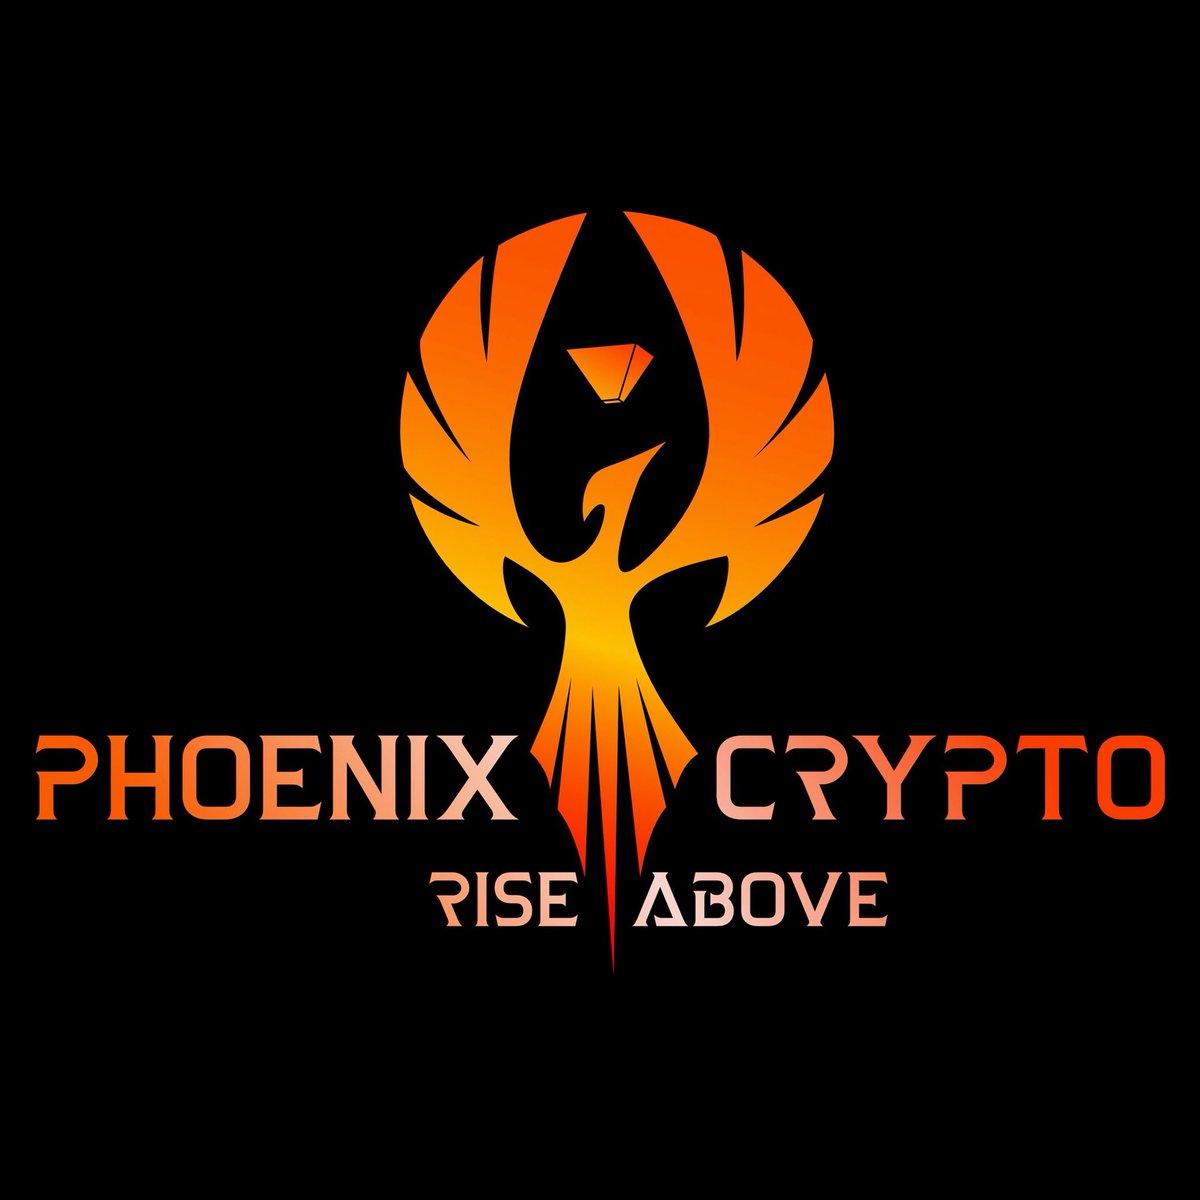 phoenix bitcoin